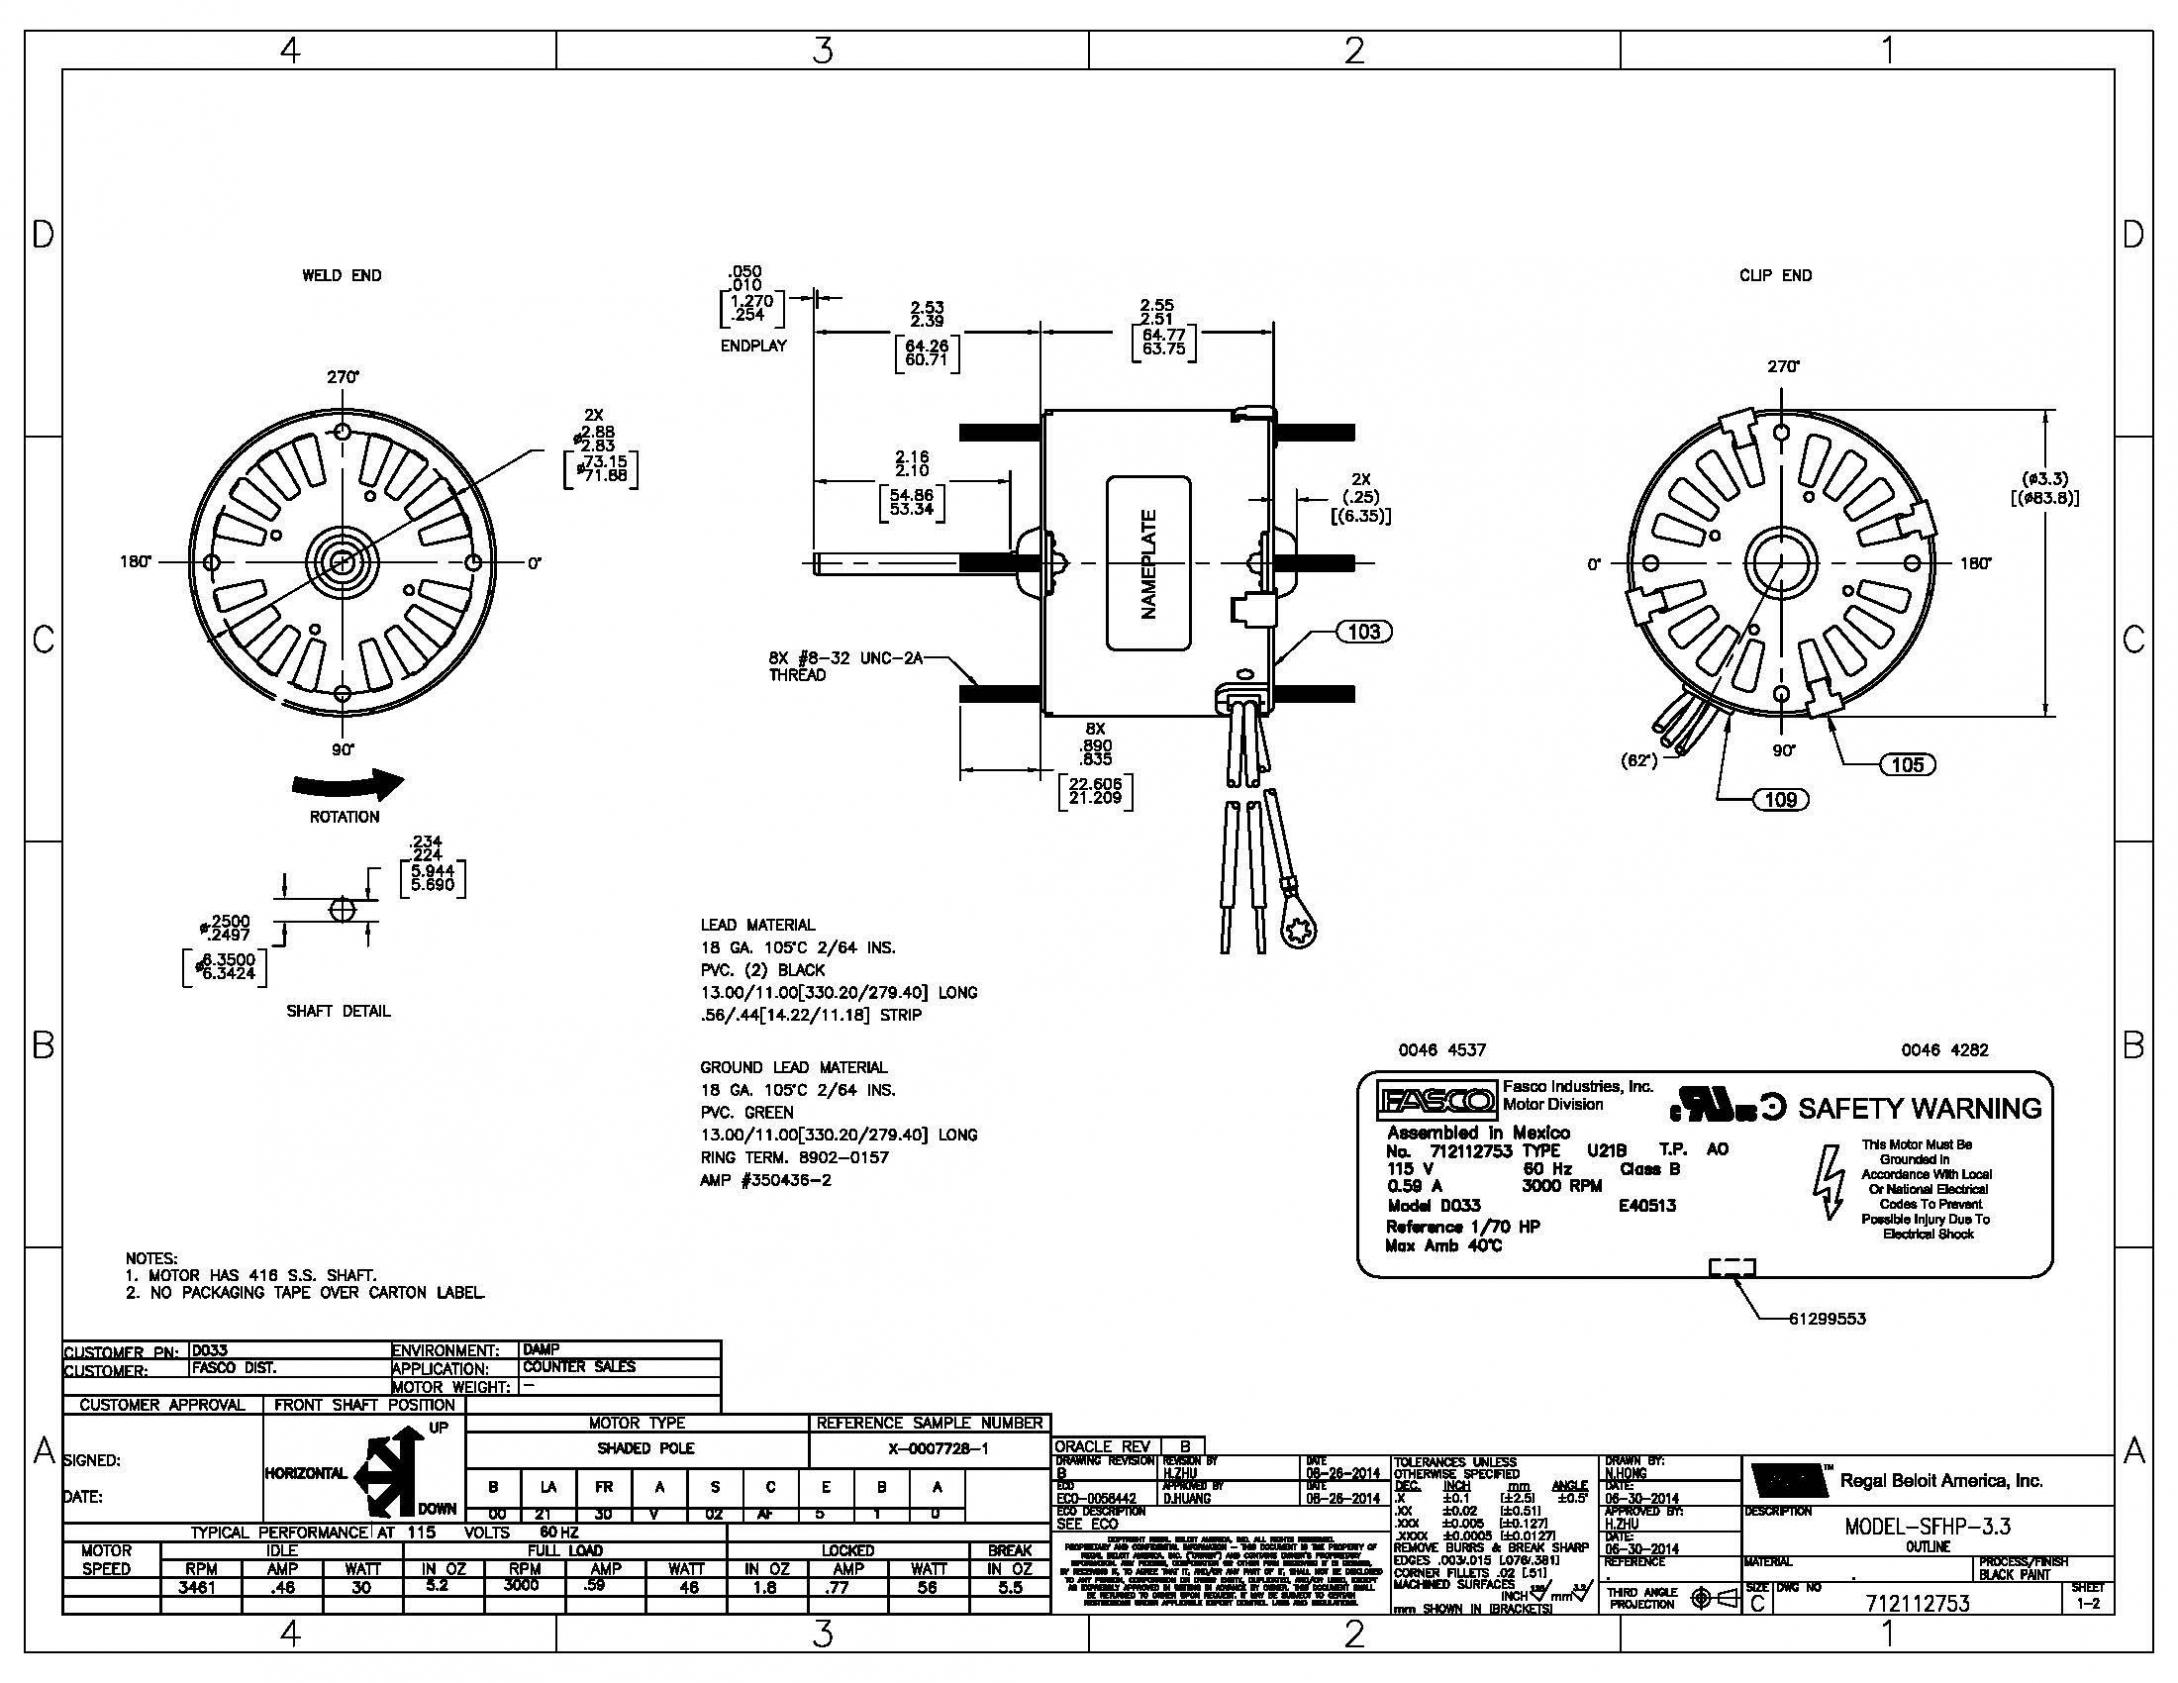 Century Electric Motors Wiring Diagram | Wiring Diagram on emerson k55hx 115v electric motor diagram, electric motor connection diagram, spa pump motor diagram, us electric motors dc,